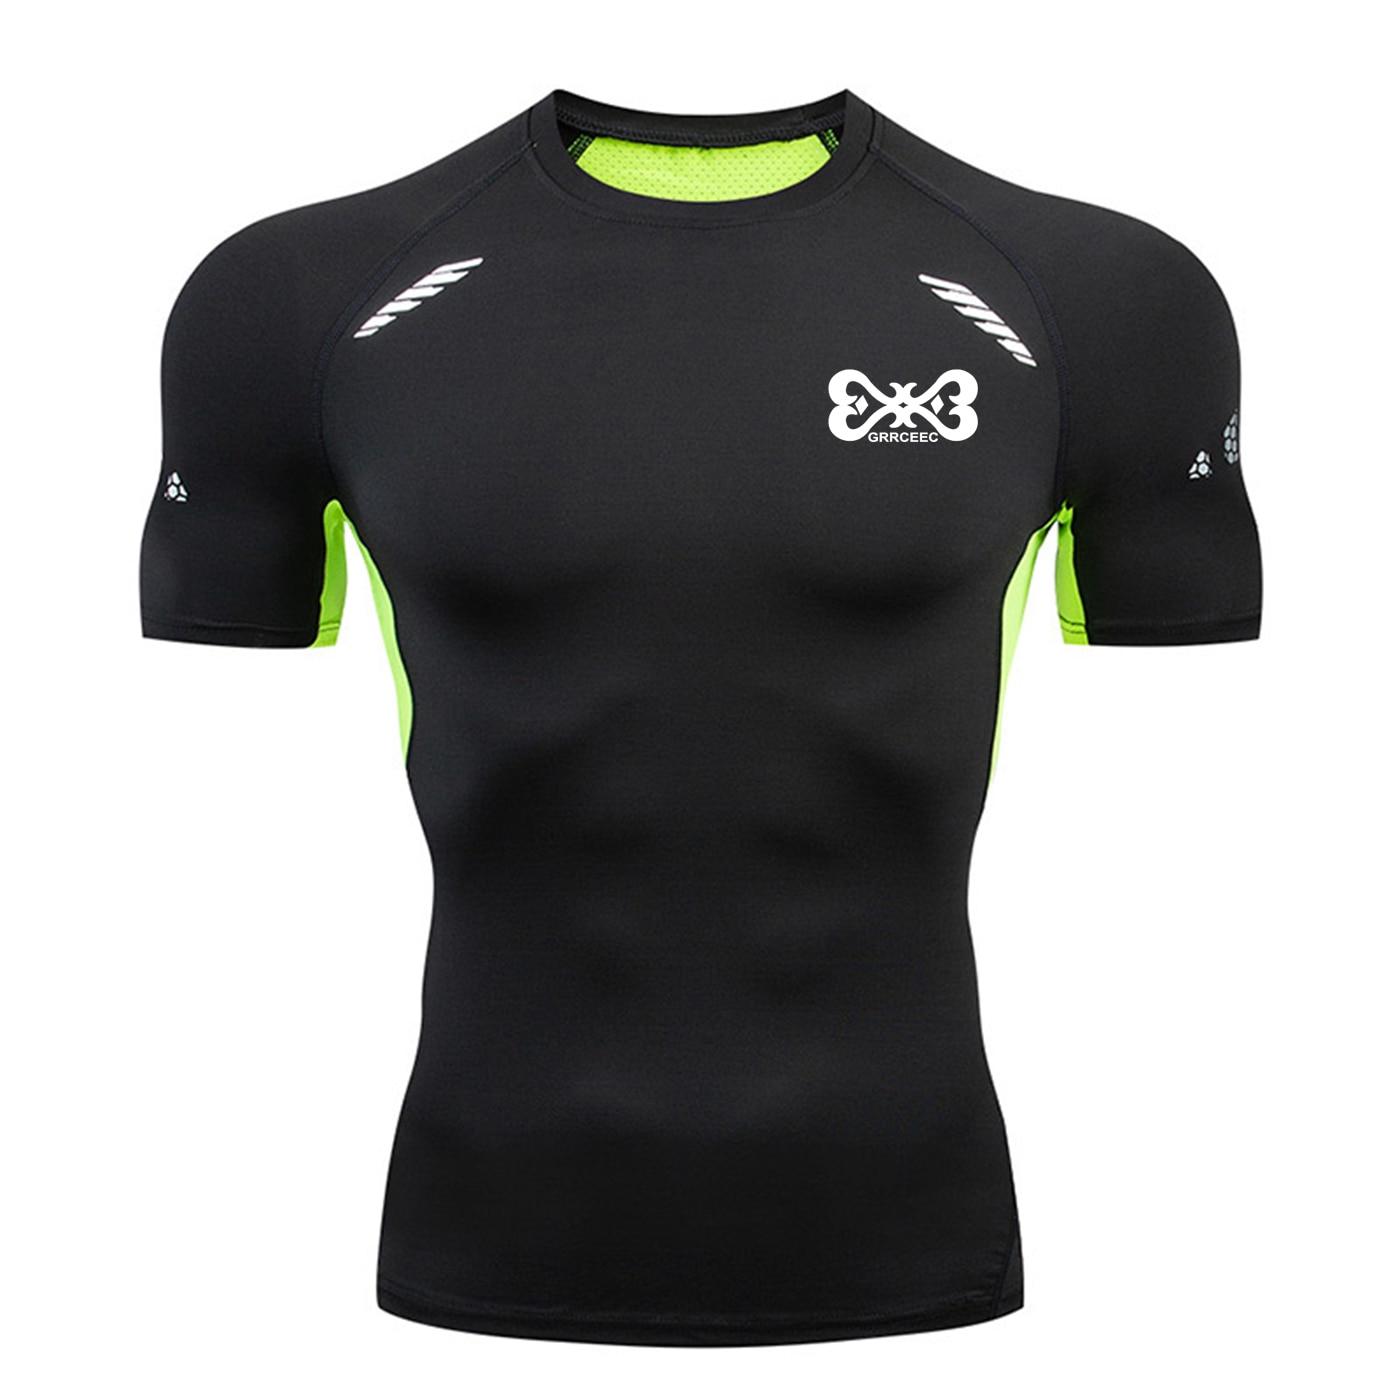 High Quality Quick-drying Men's Shirt Sports Find Gym Men's Rash Sportswear Compression Fitness Top Running Men's Sports Shirt